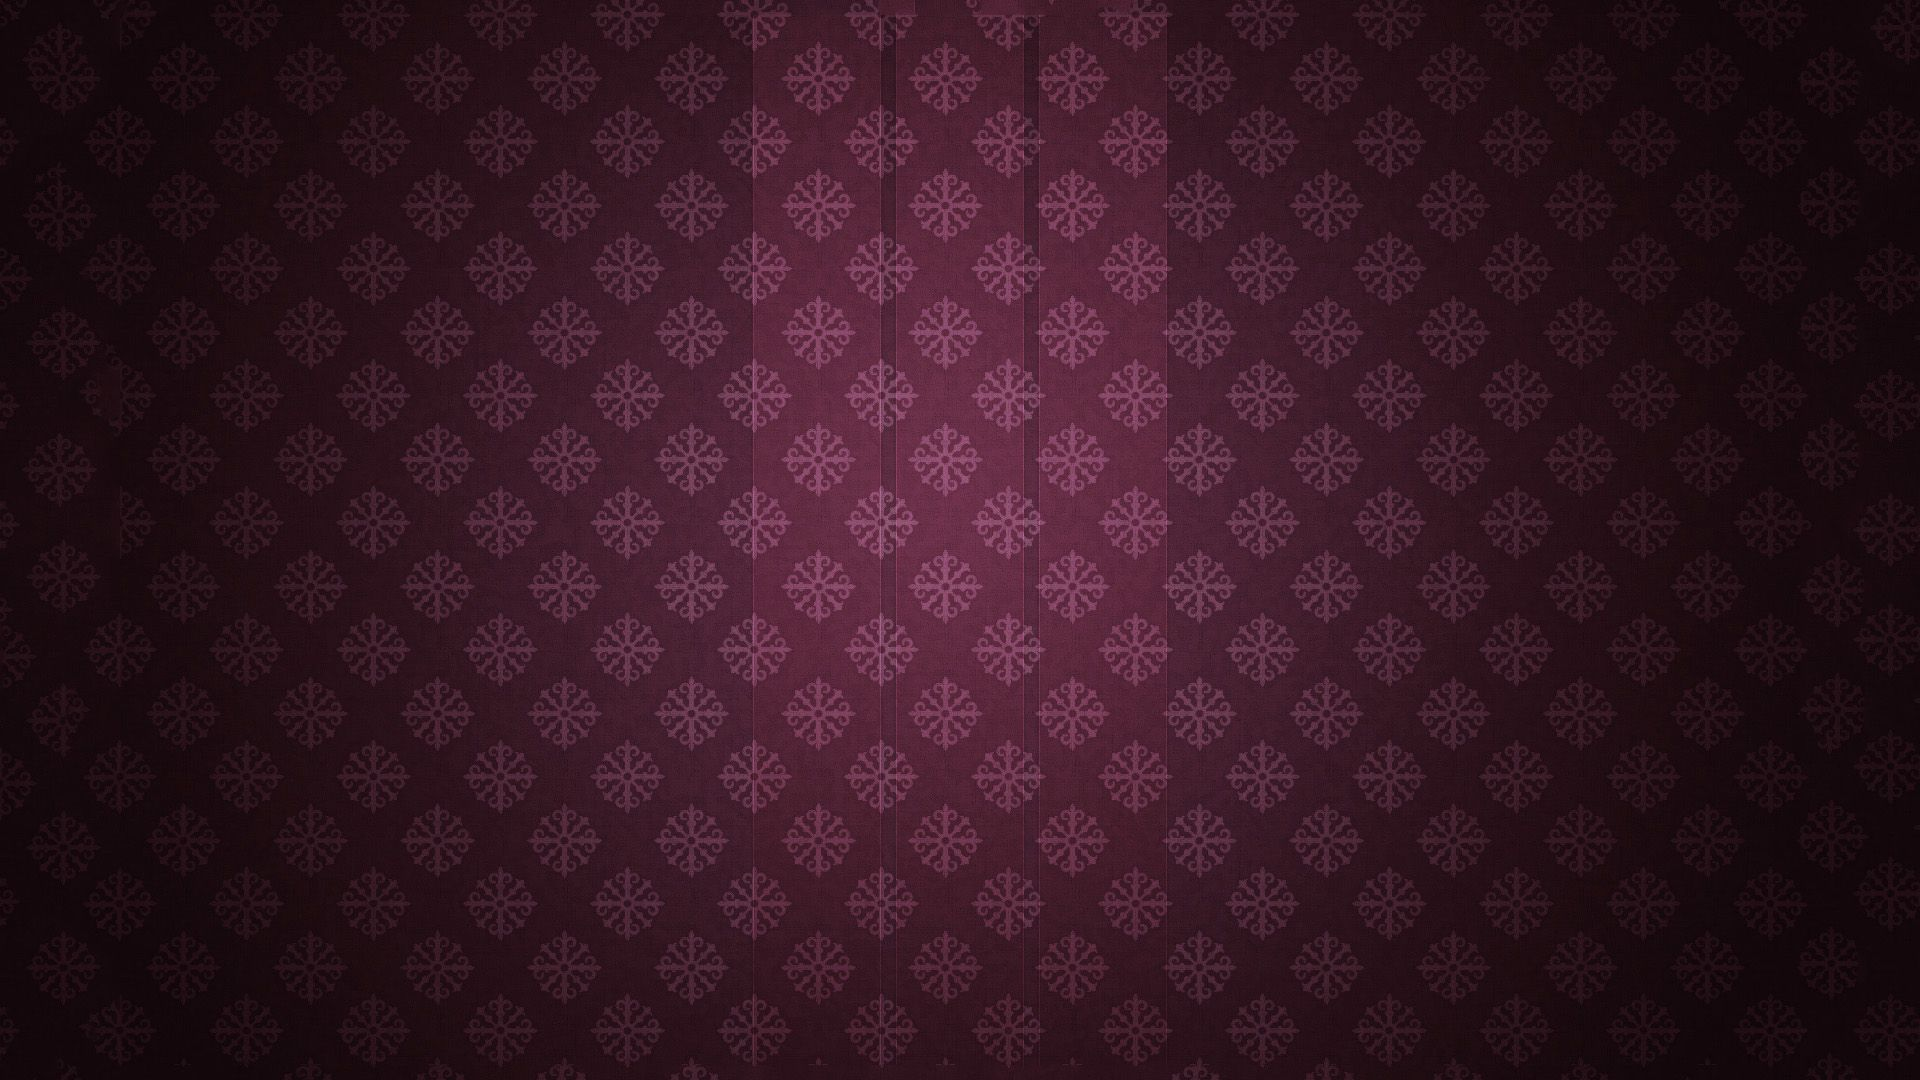 Elegant download wallpaper image